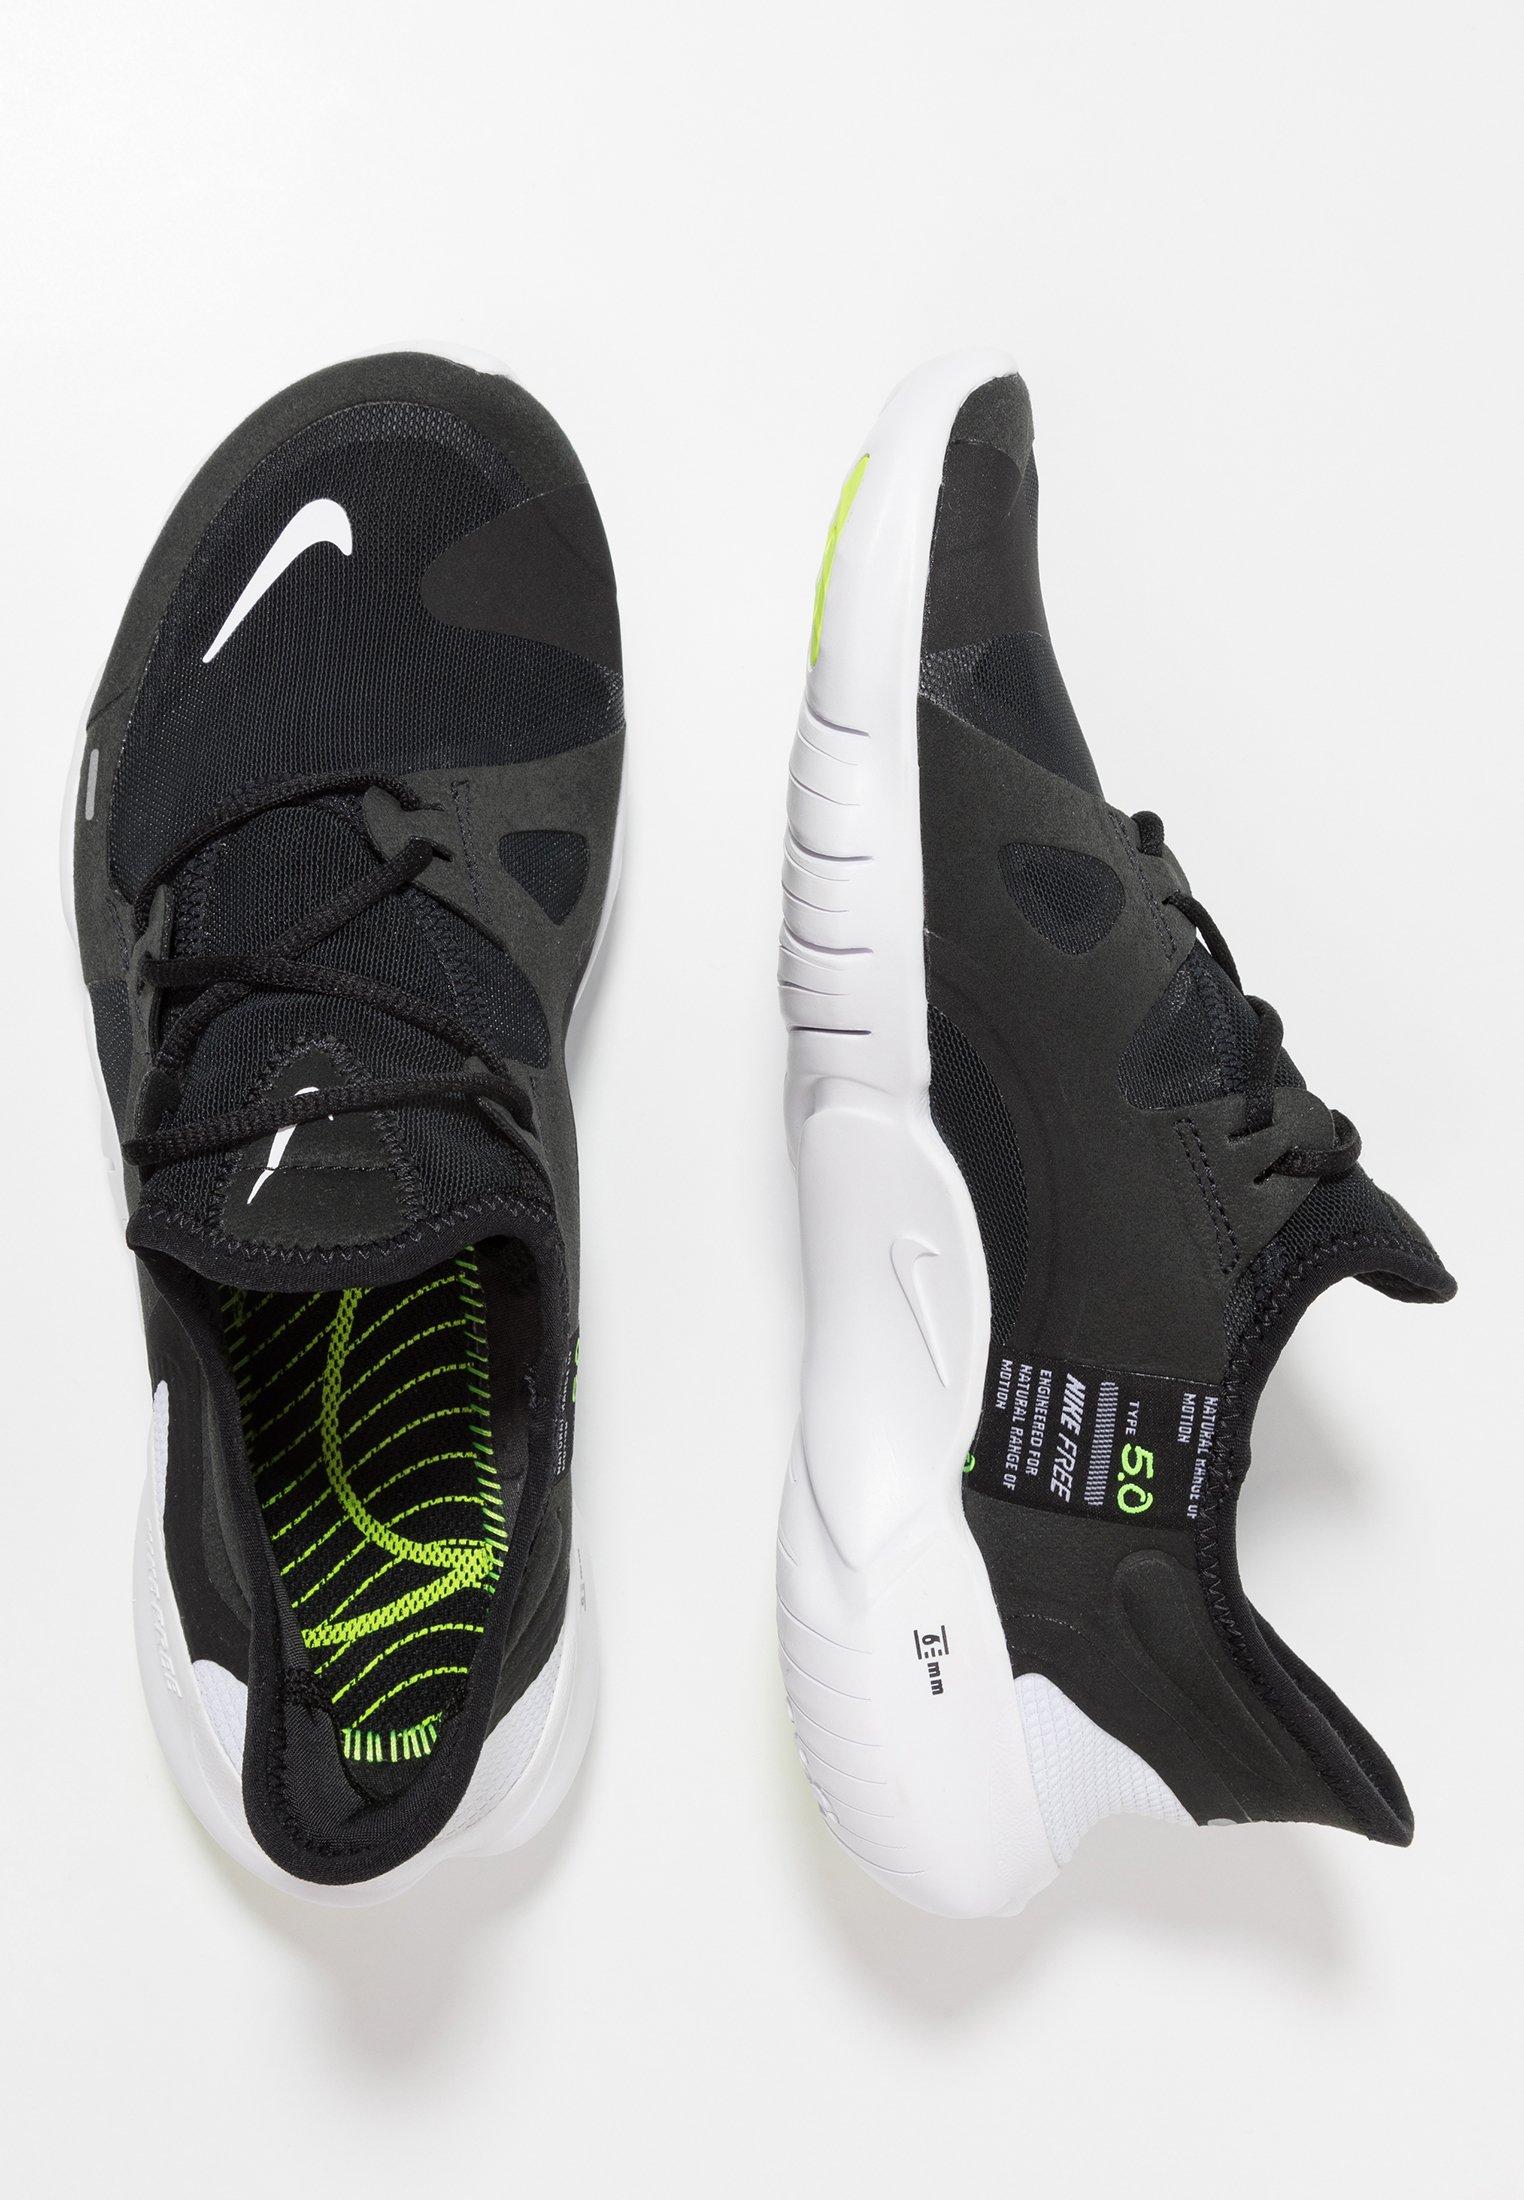 Nike Performance Free Rn 5.0 - Loopschoen Neutraal Black/white/anthracite/volt Goedkope Schoenen